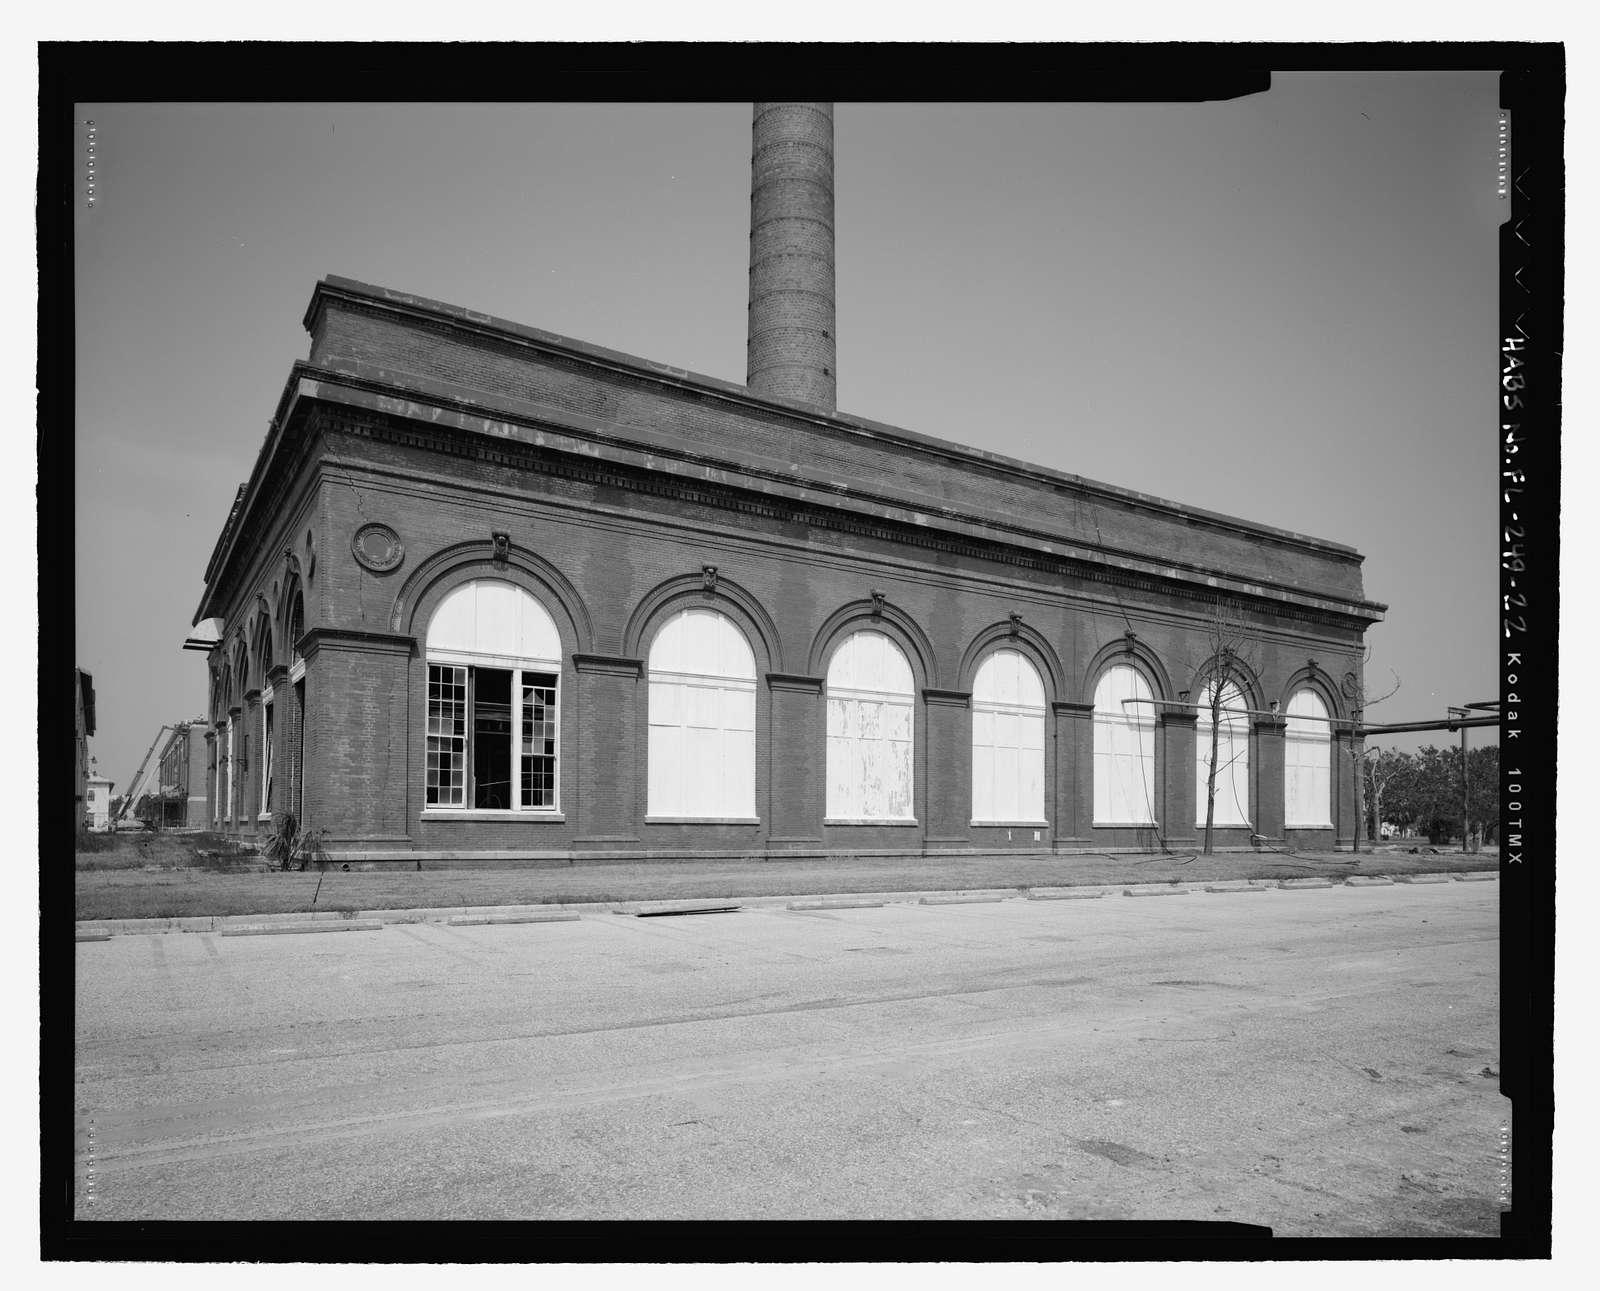 U.S. Naval Air Station, Power Plant, 328 South Avenue, Pensacola, Escambia County, FL